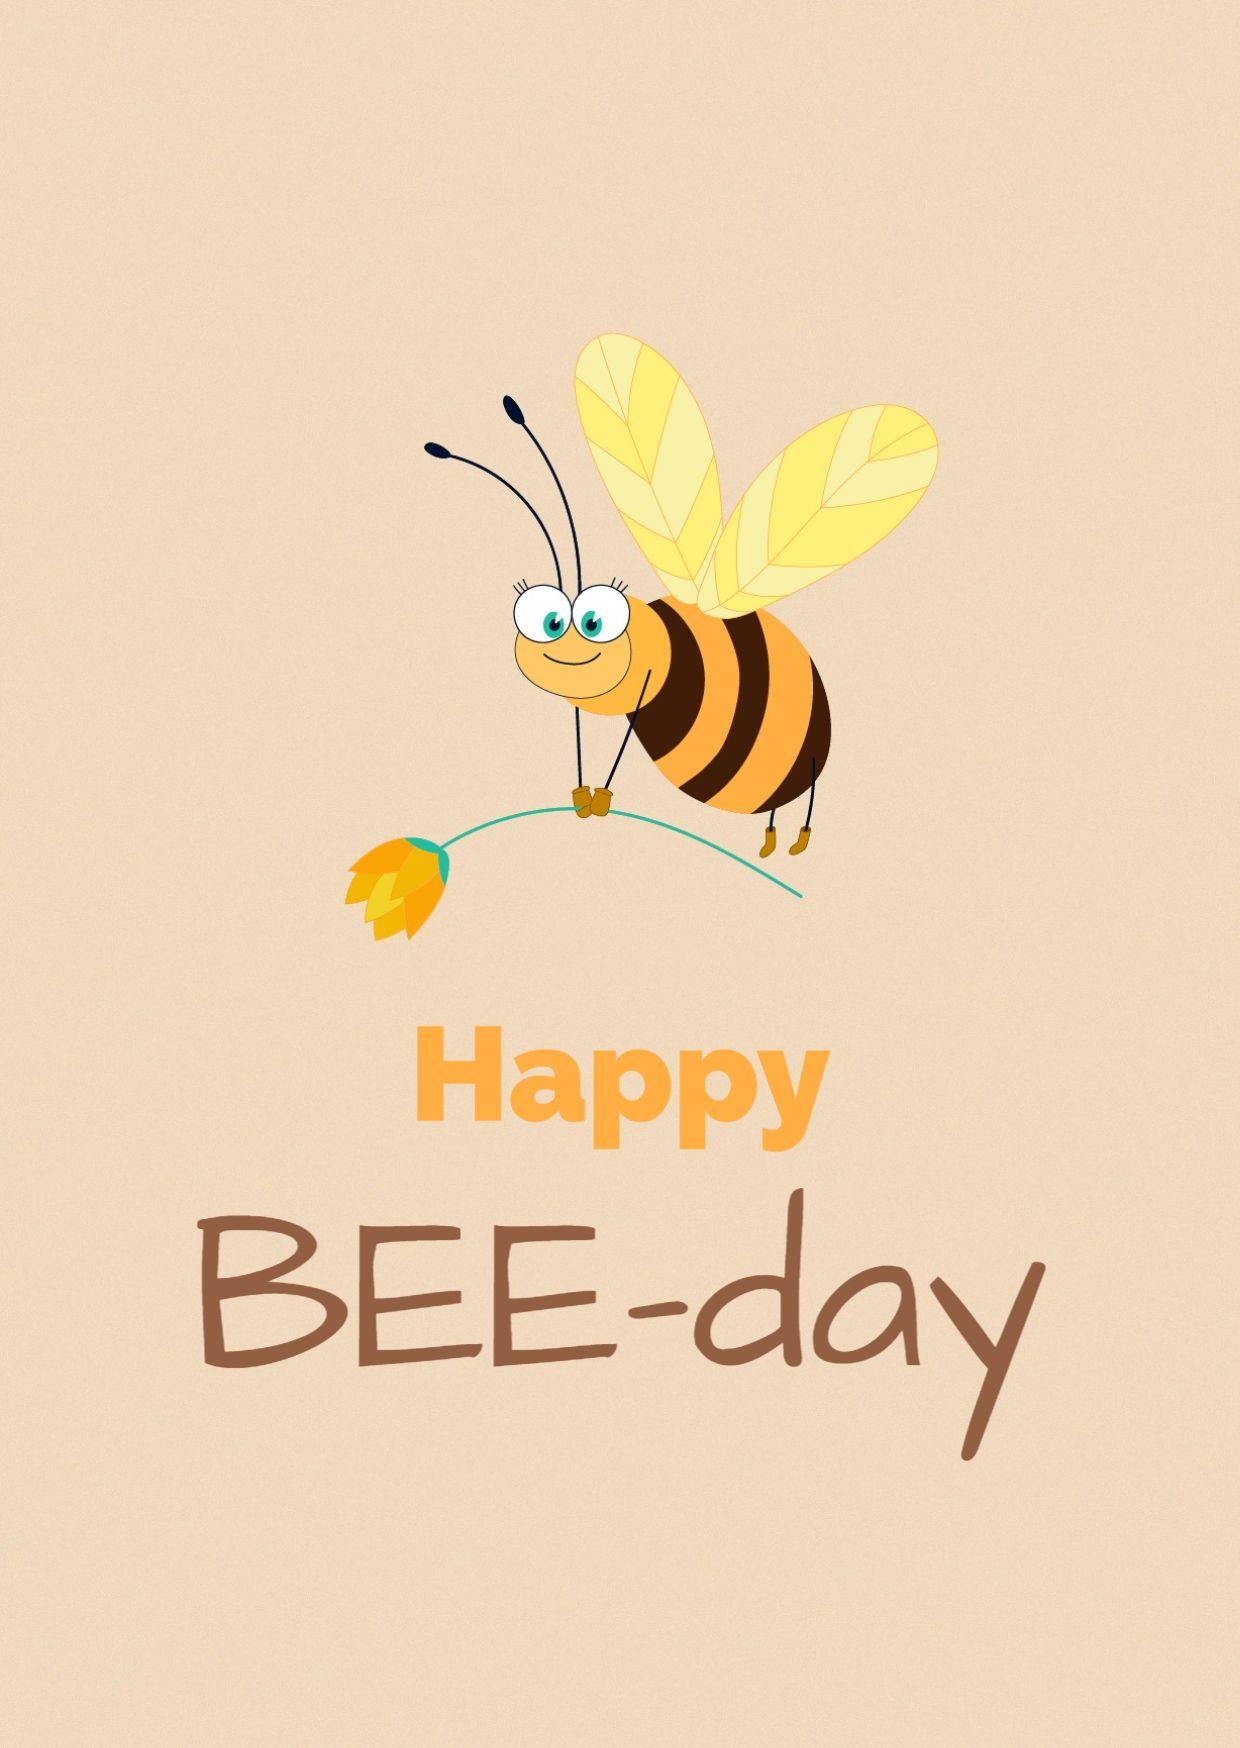 BeeDay Birthday Greeting Card Template